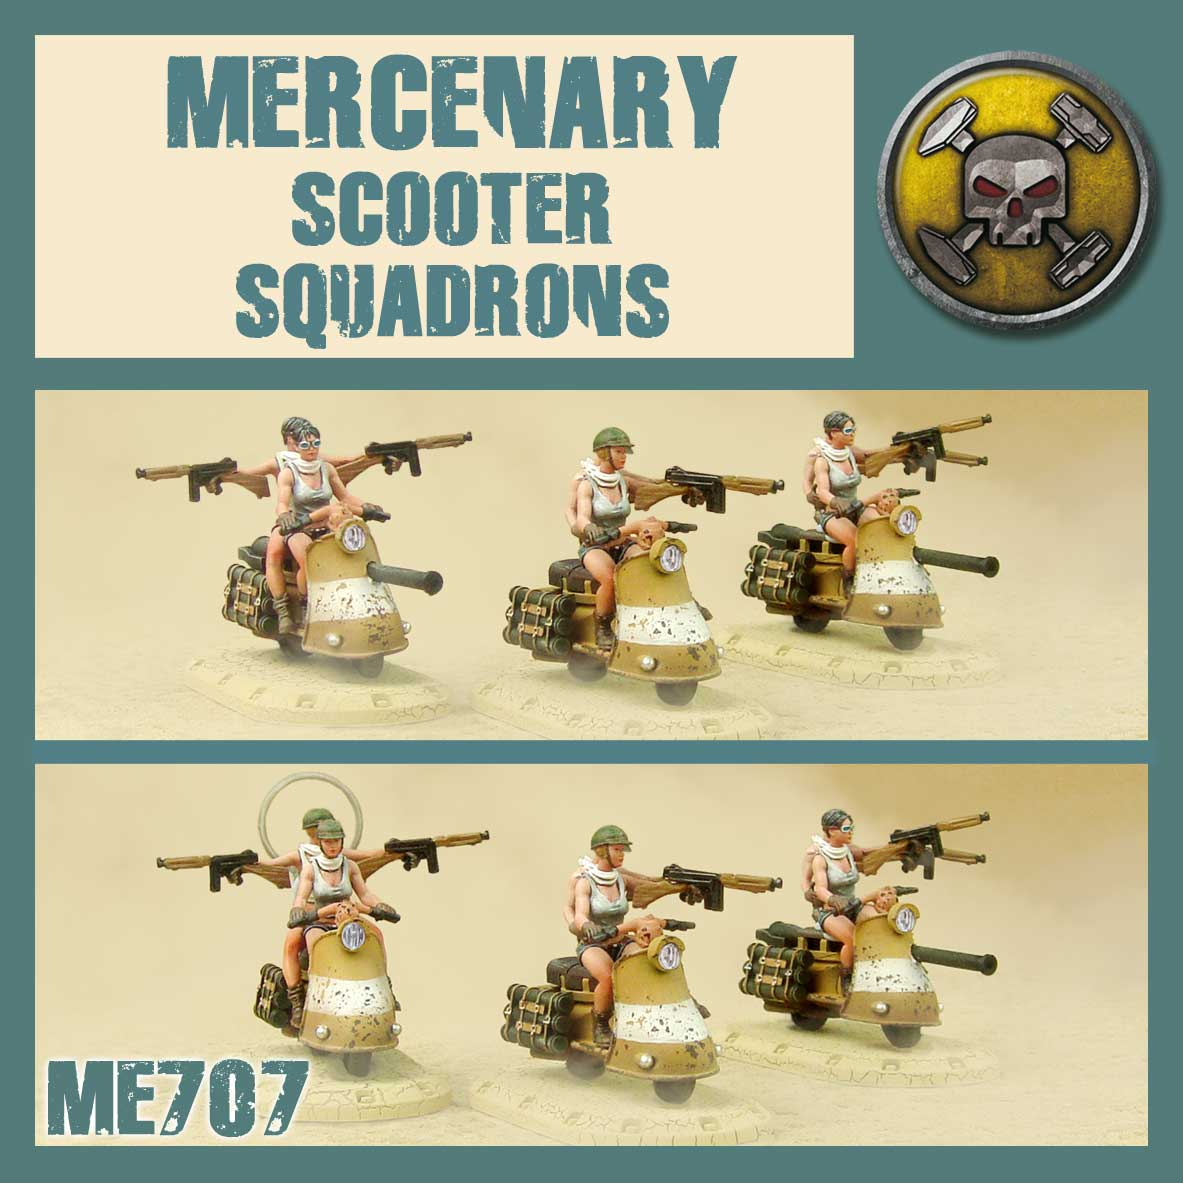 Mercenary Scooter Squadron